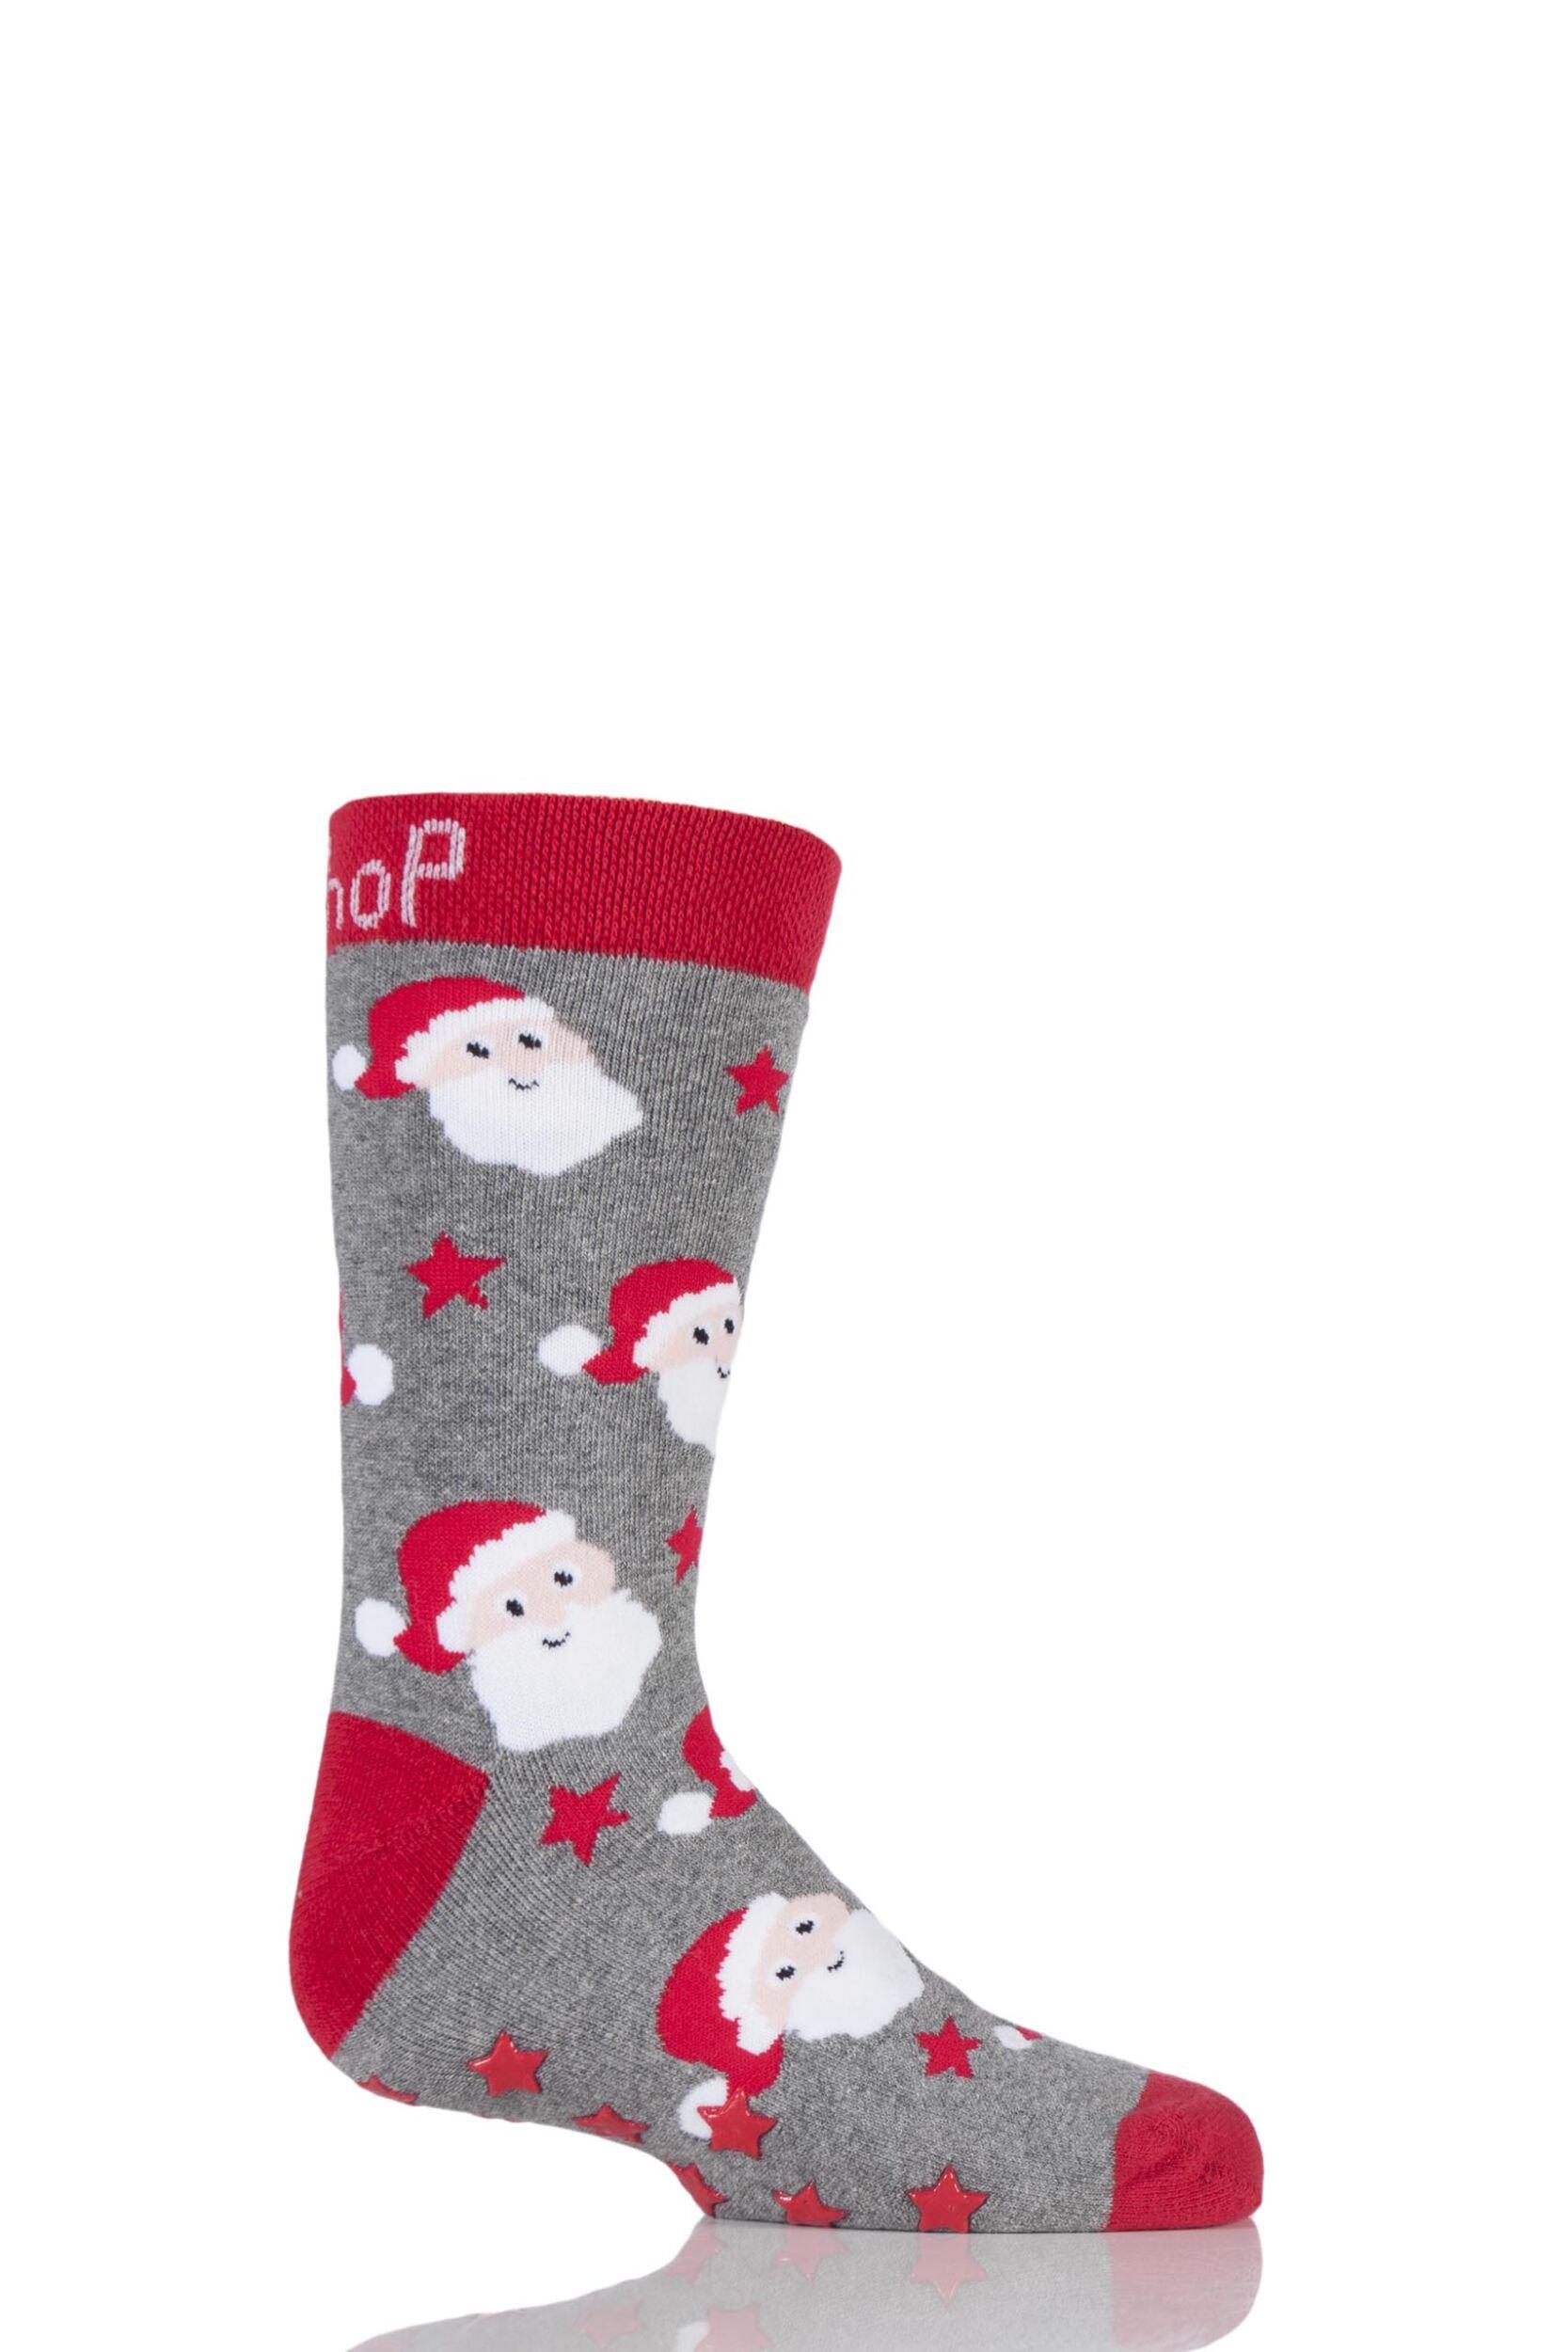 Kids 1 Pair SockShop Christmas Santa Slipper Socks | EBay